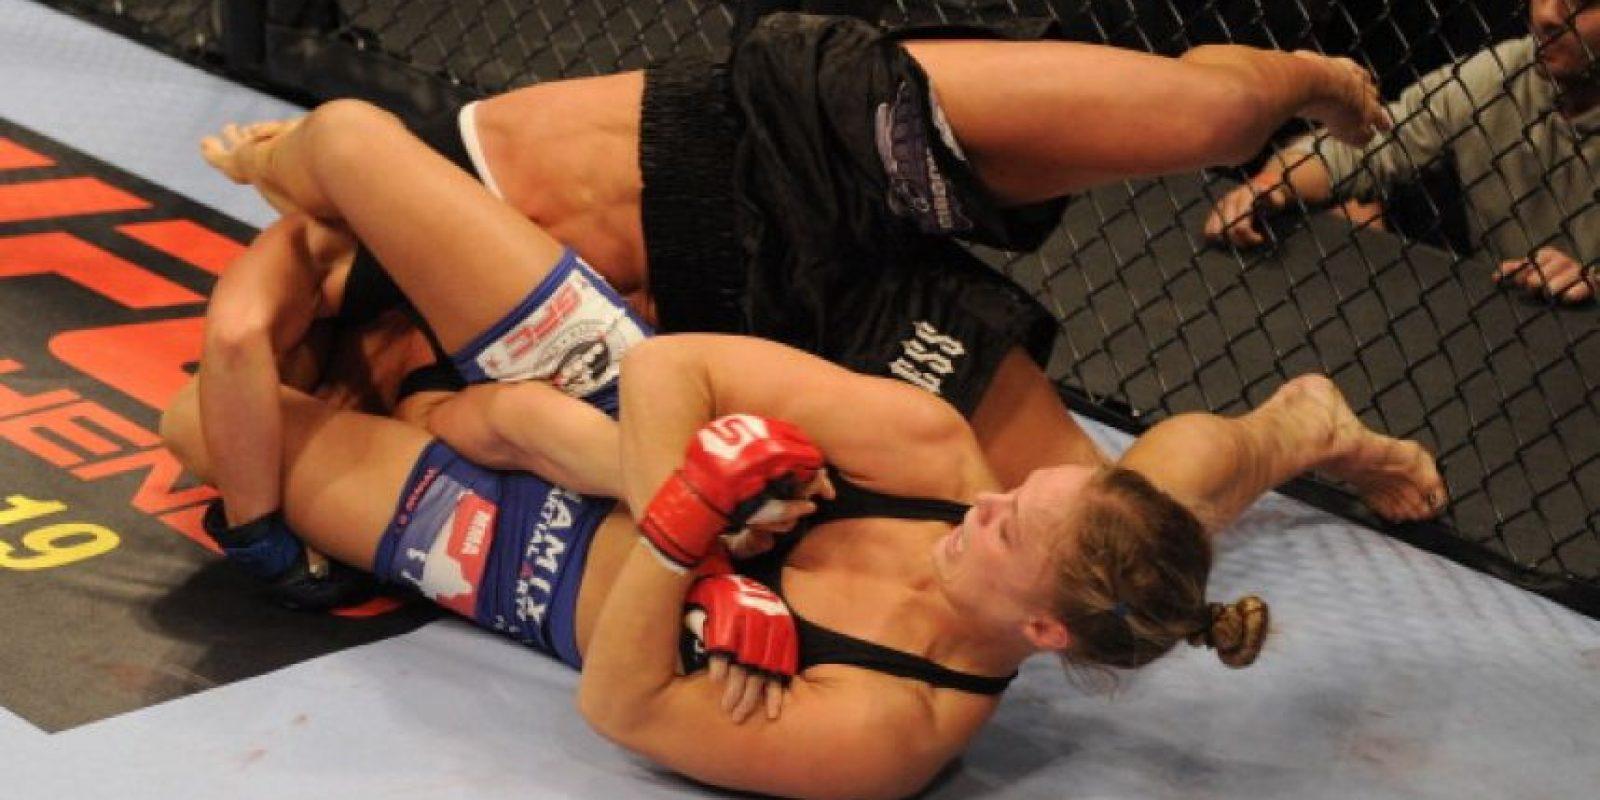 4-0 vs. Julia Budd en Strikerforce Challengers 20. Foto:Getty Images